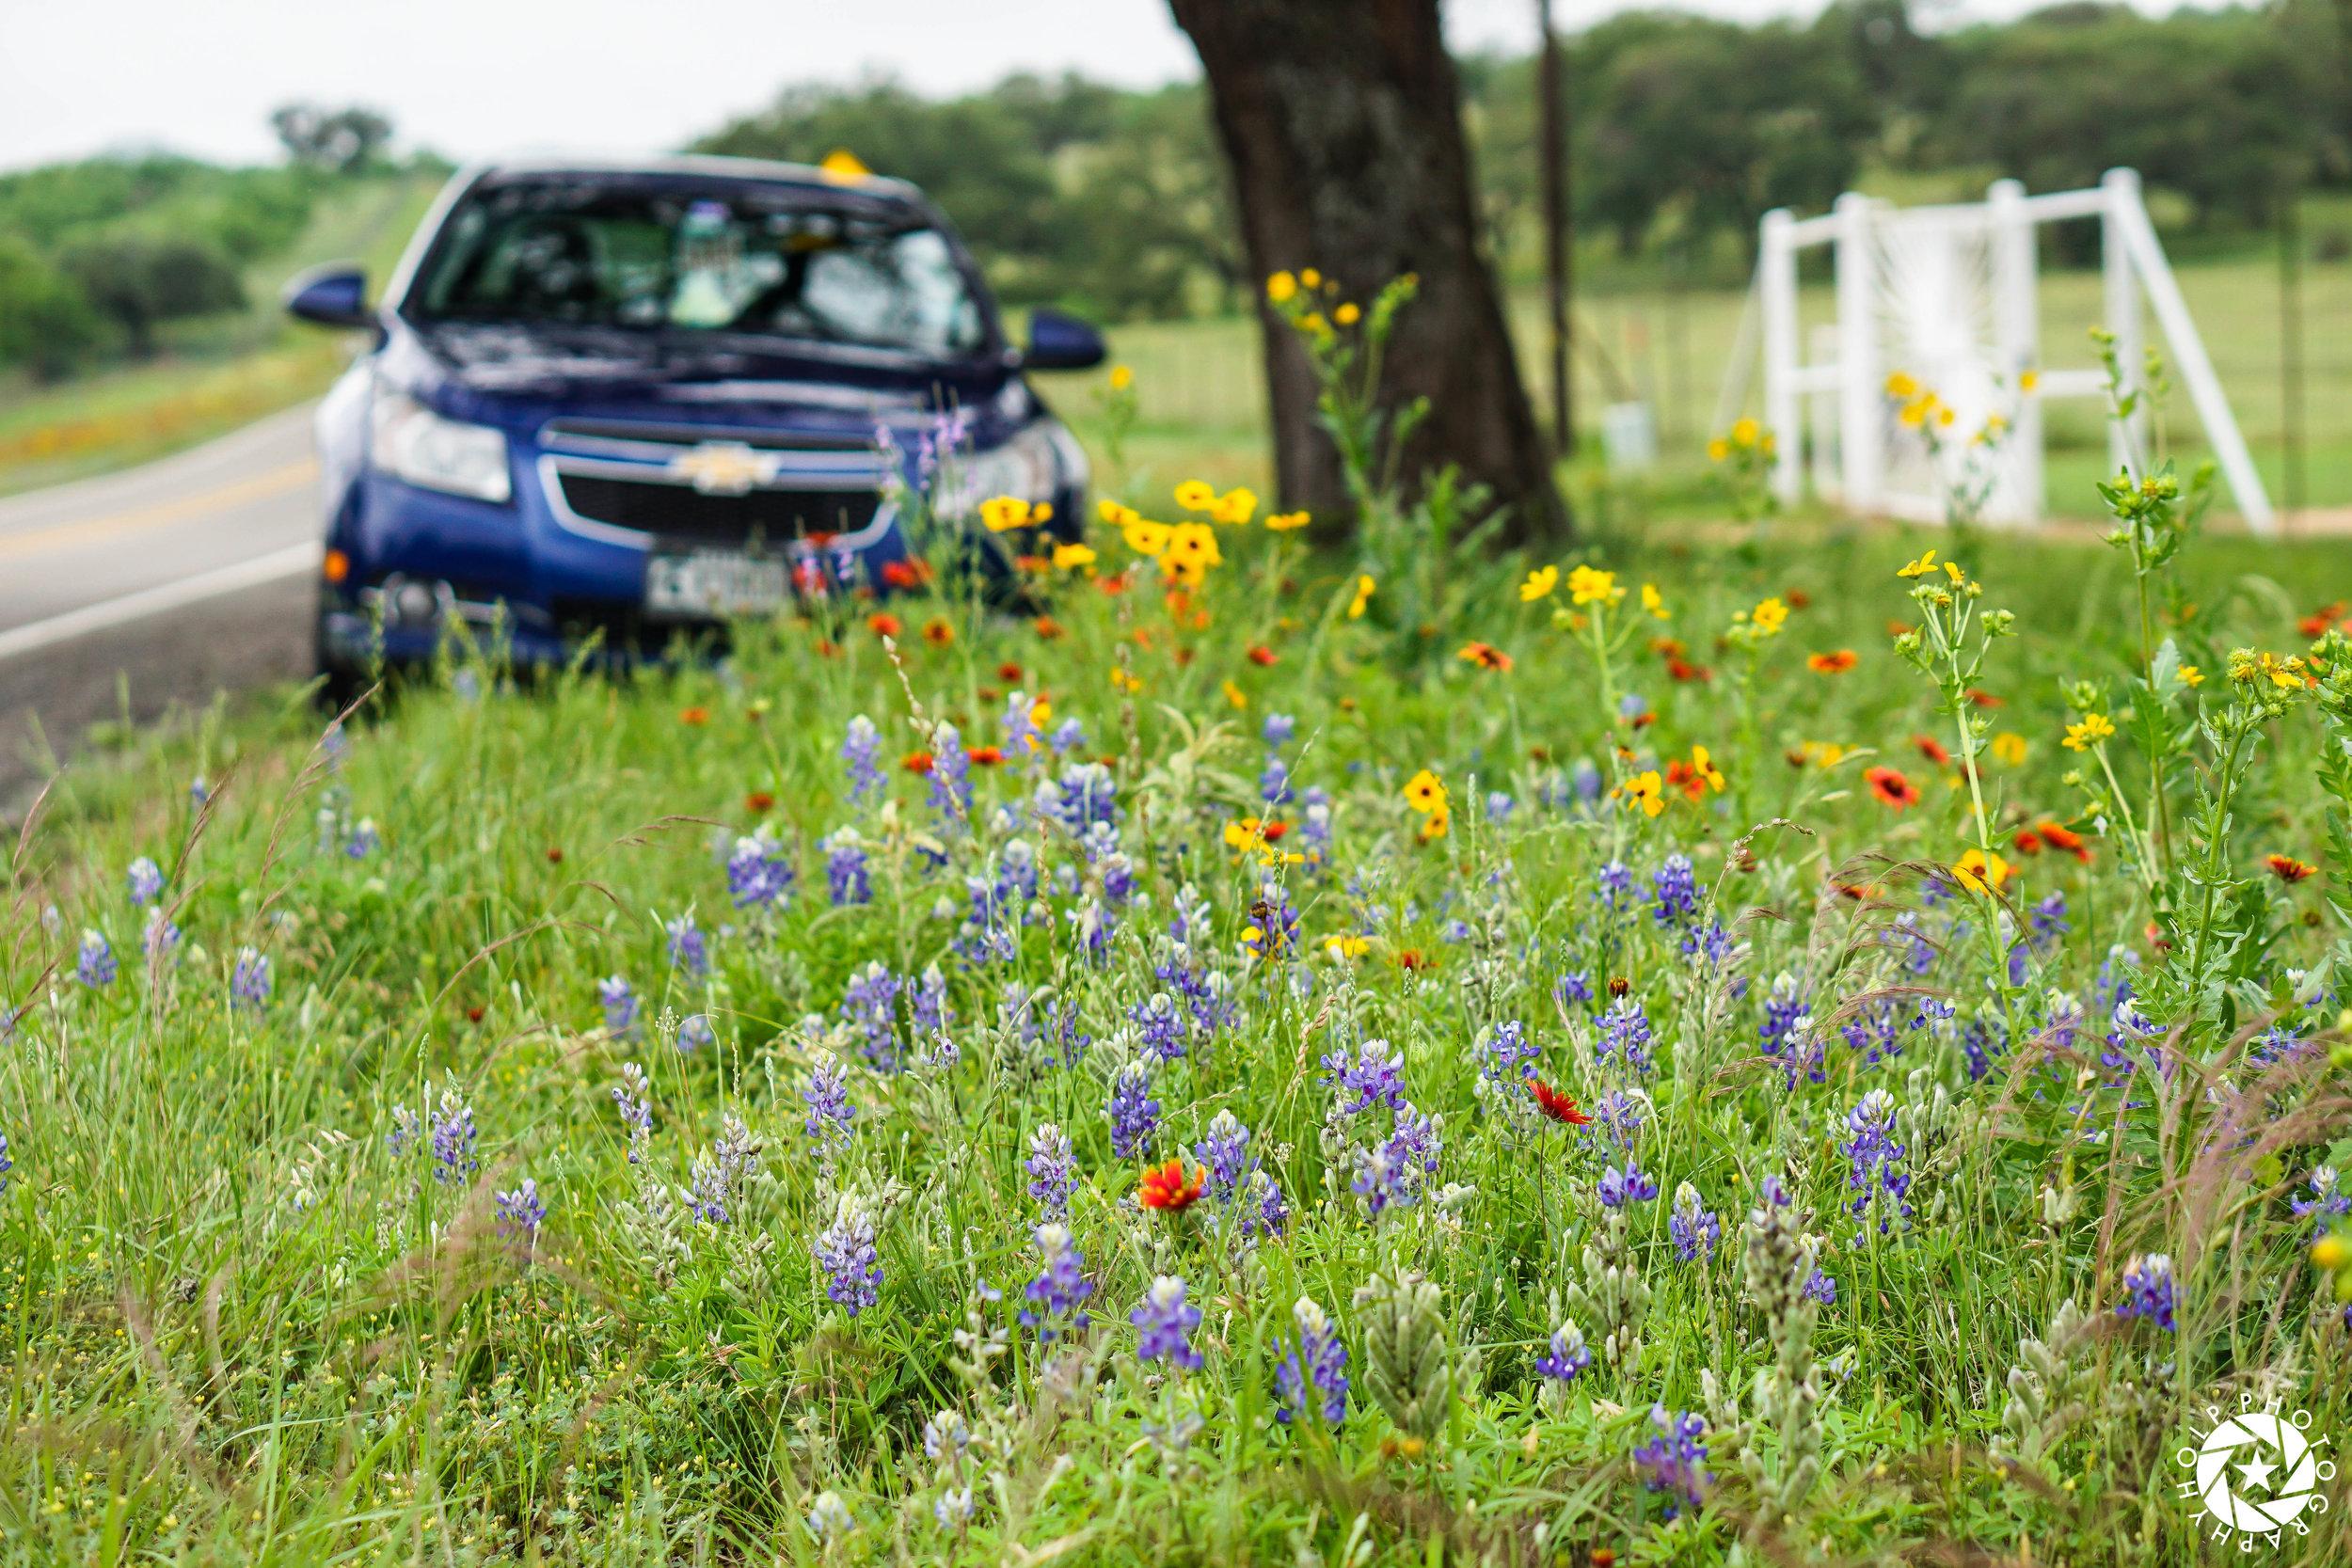 Wildflowers along the road near Llano, Texas.